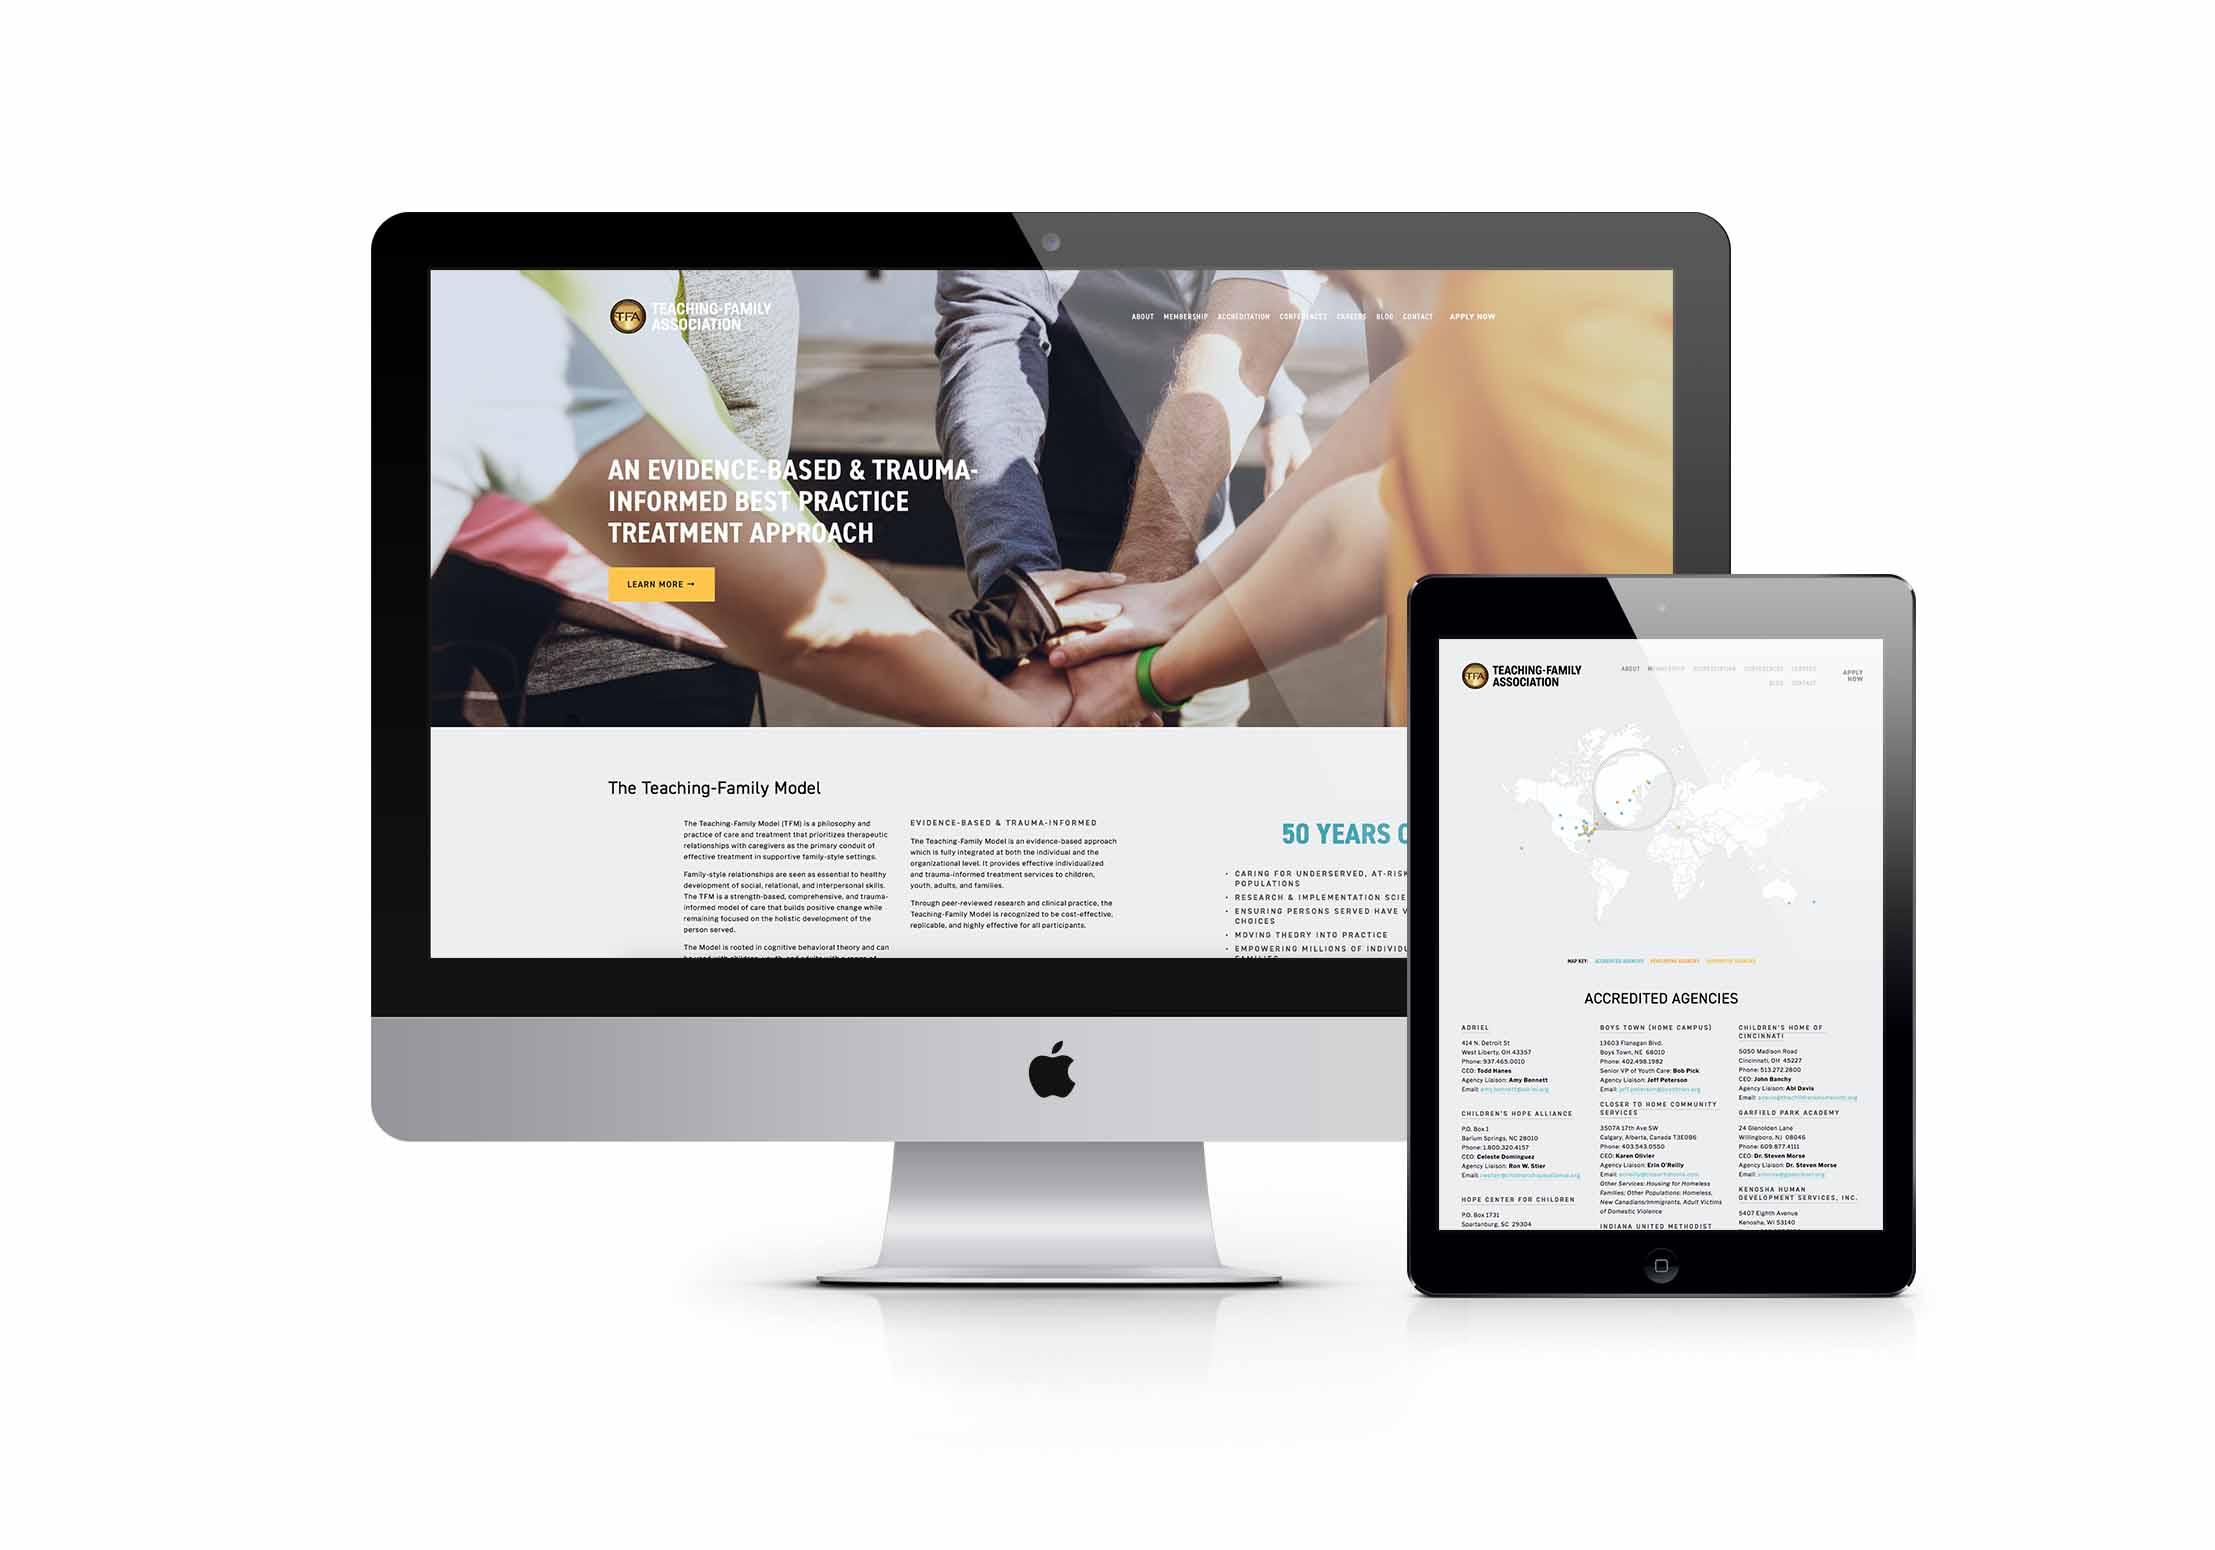 TF Website design members